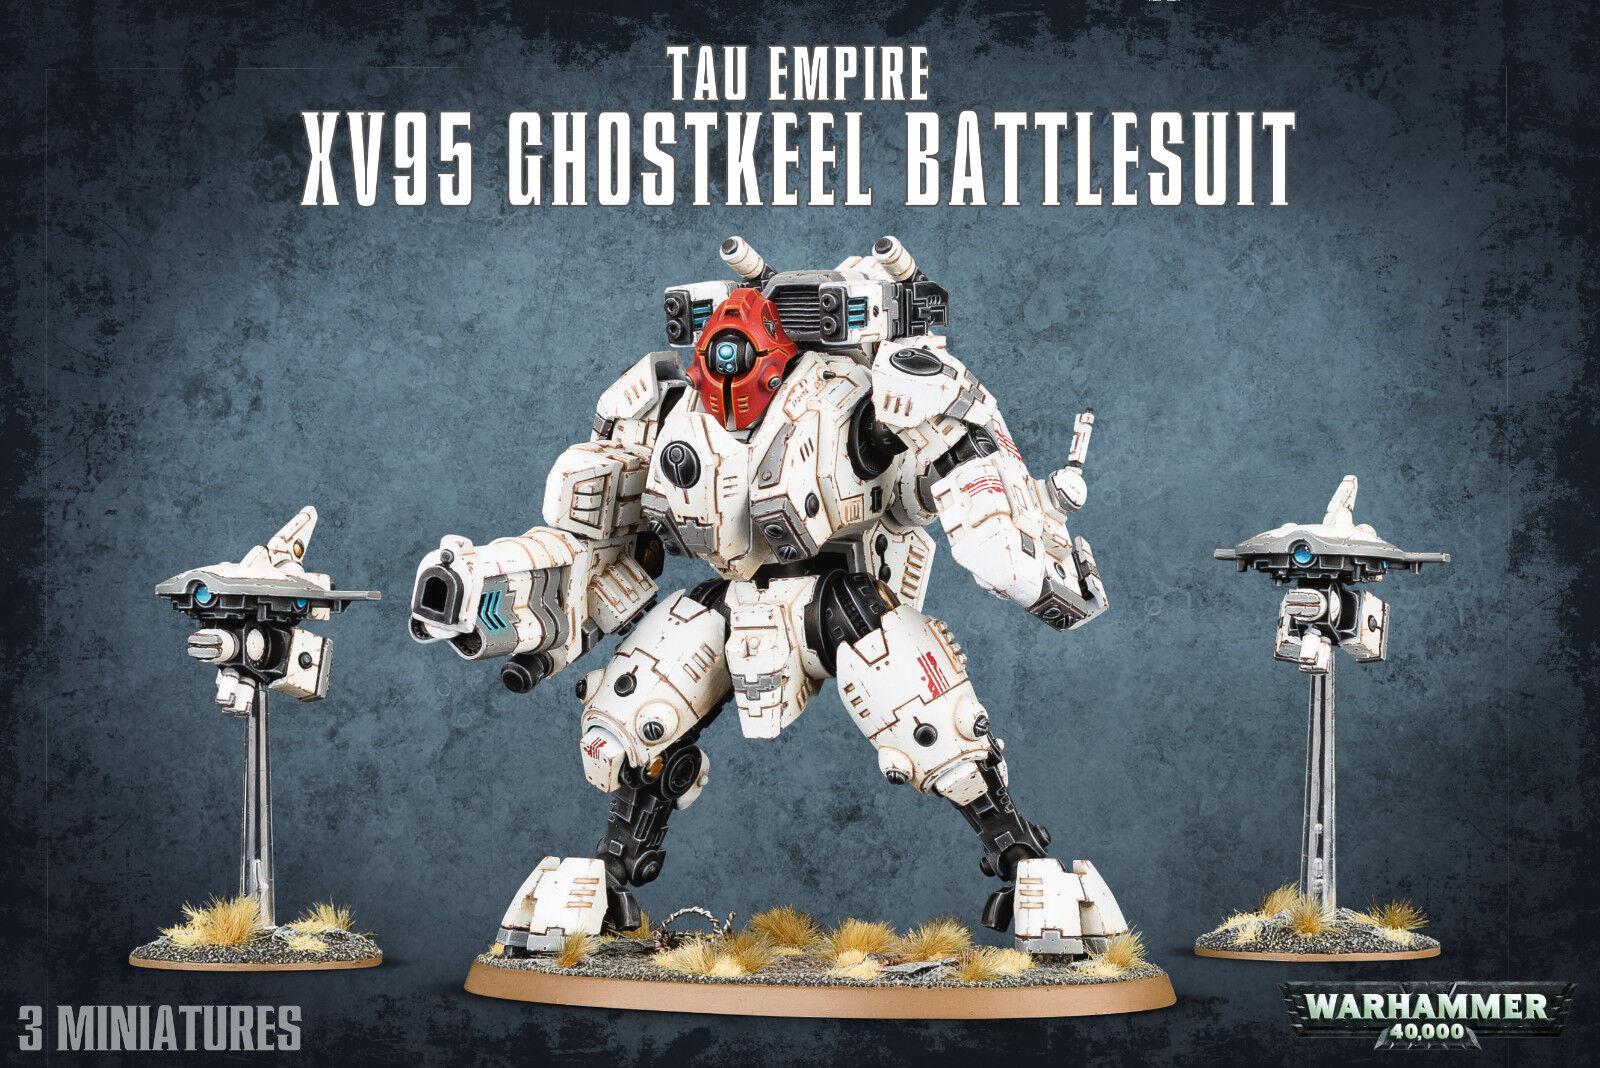 despacho de tienda T'au Imperio XV95 ghostkeel Battlesuit Battlesuit Battlesuit Tau Warhammer 40k Nuevo  barato